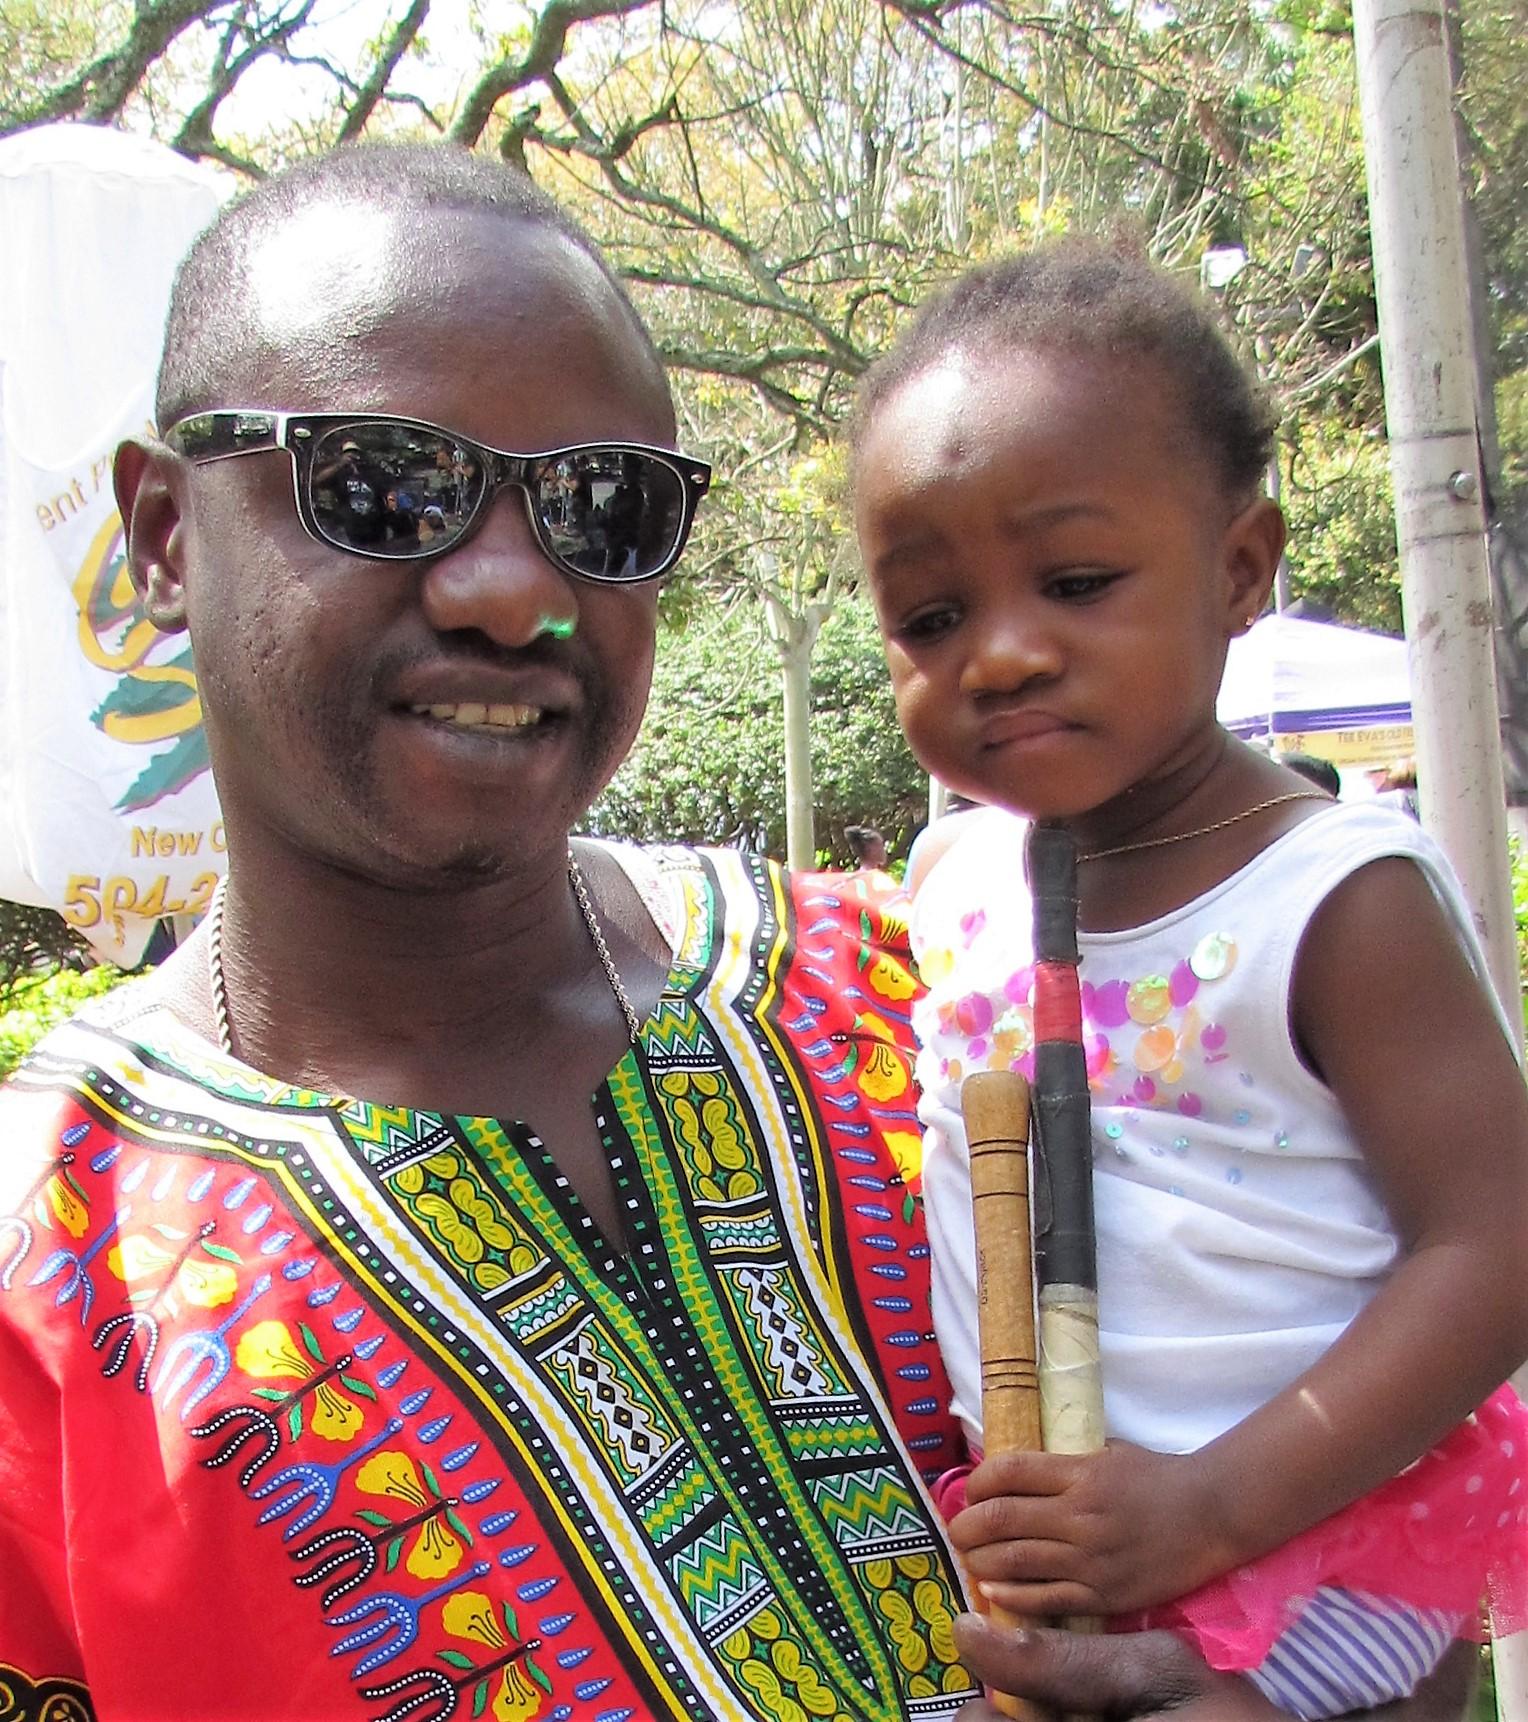 Congo Square Fest 2017